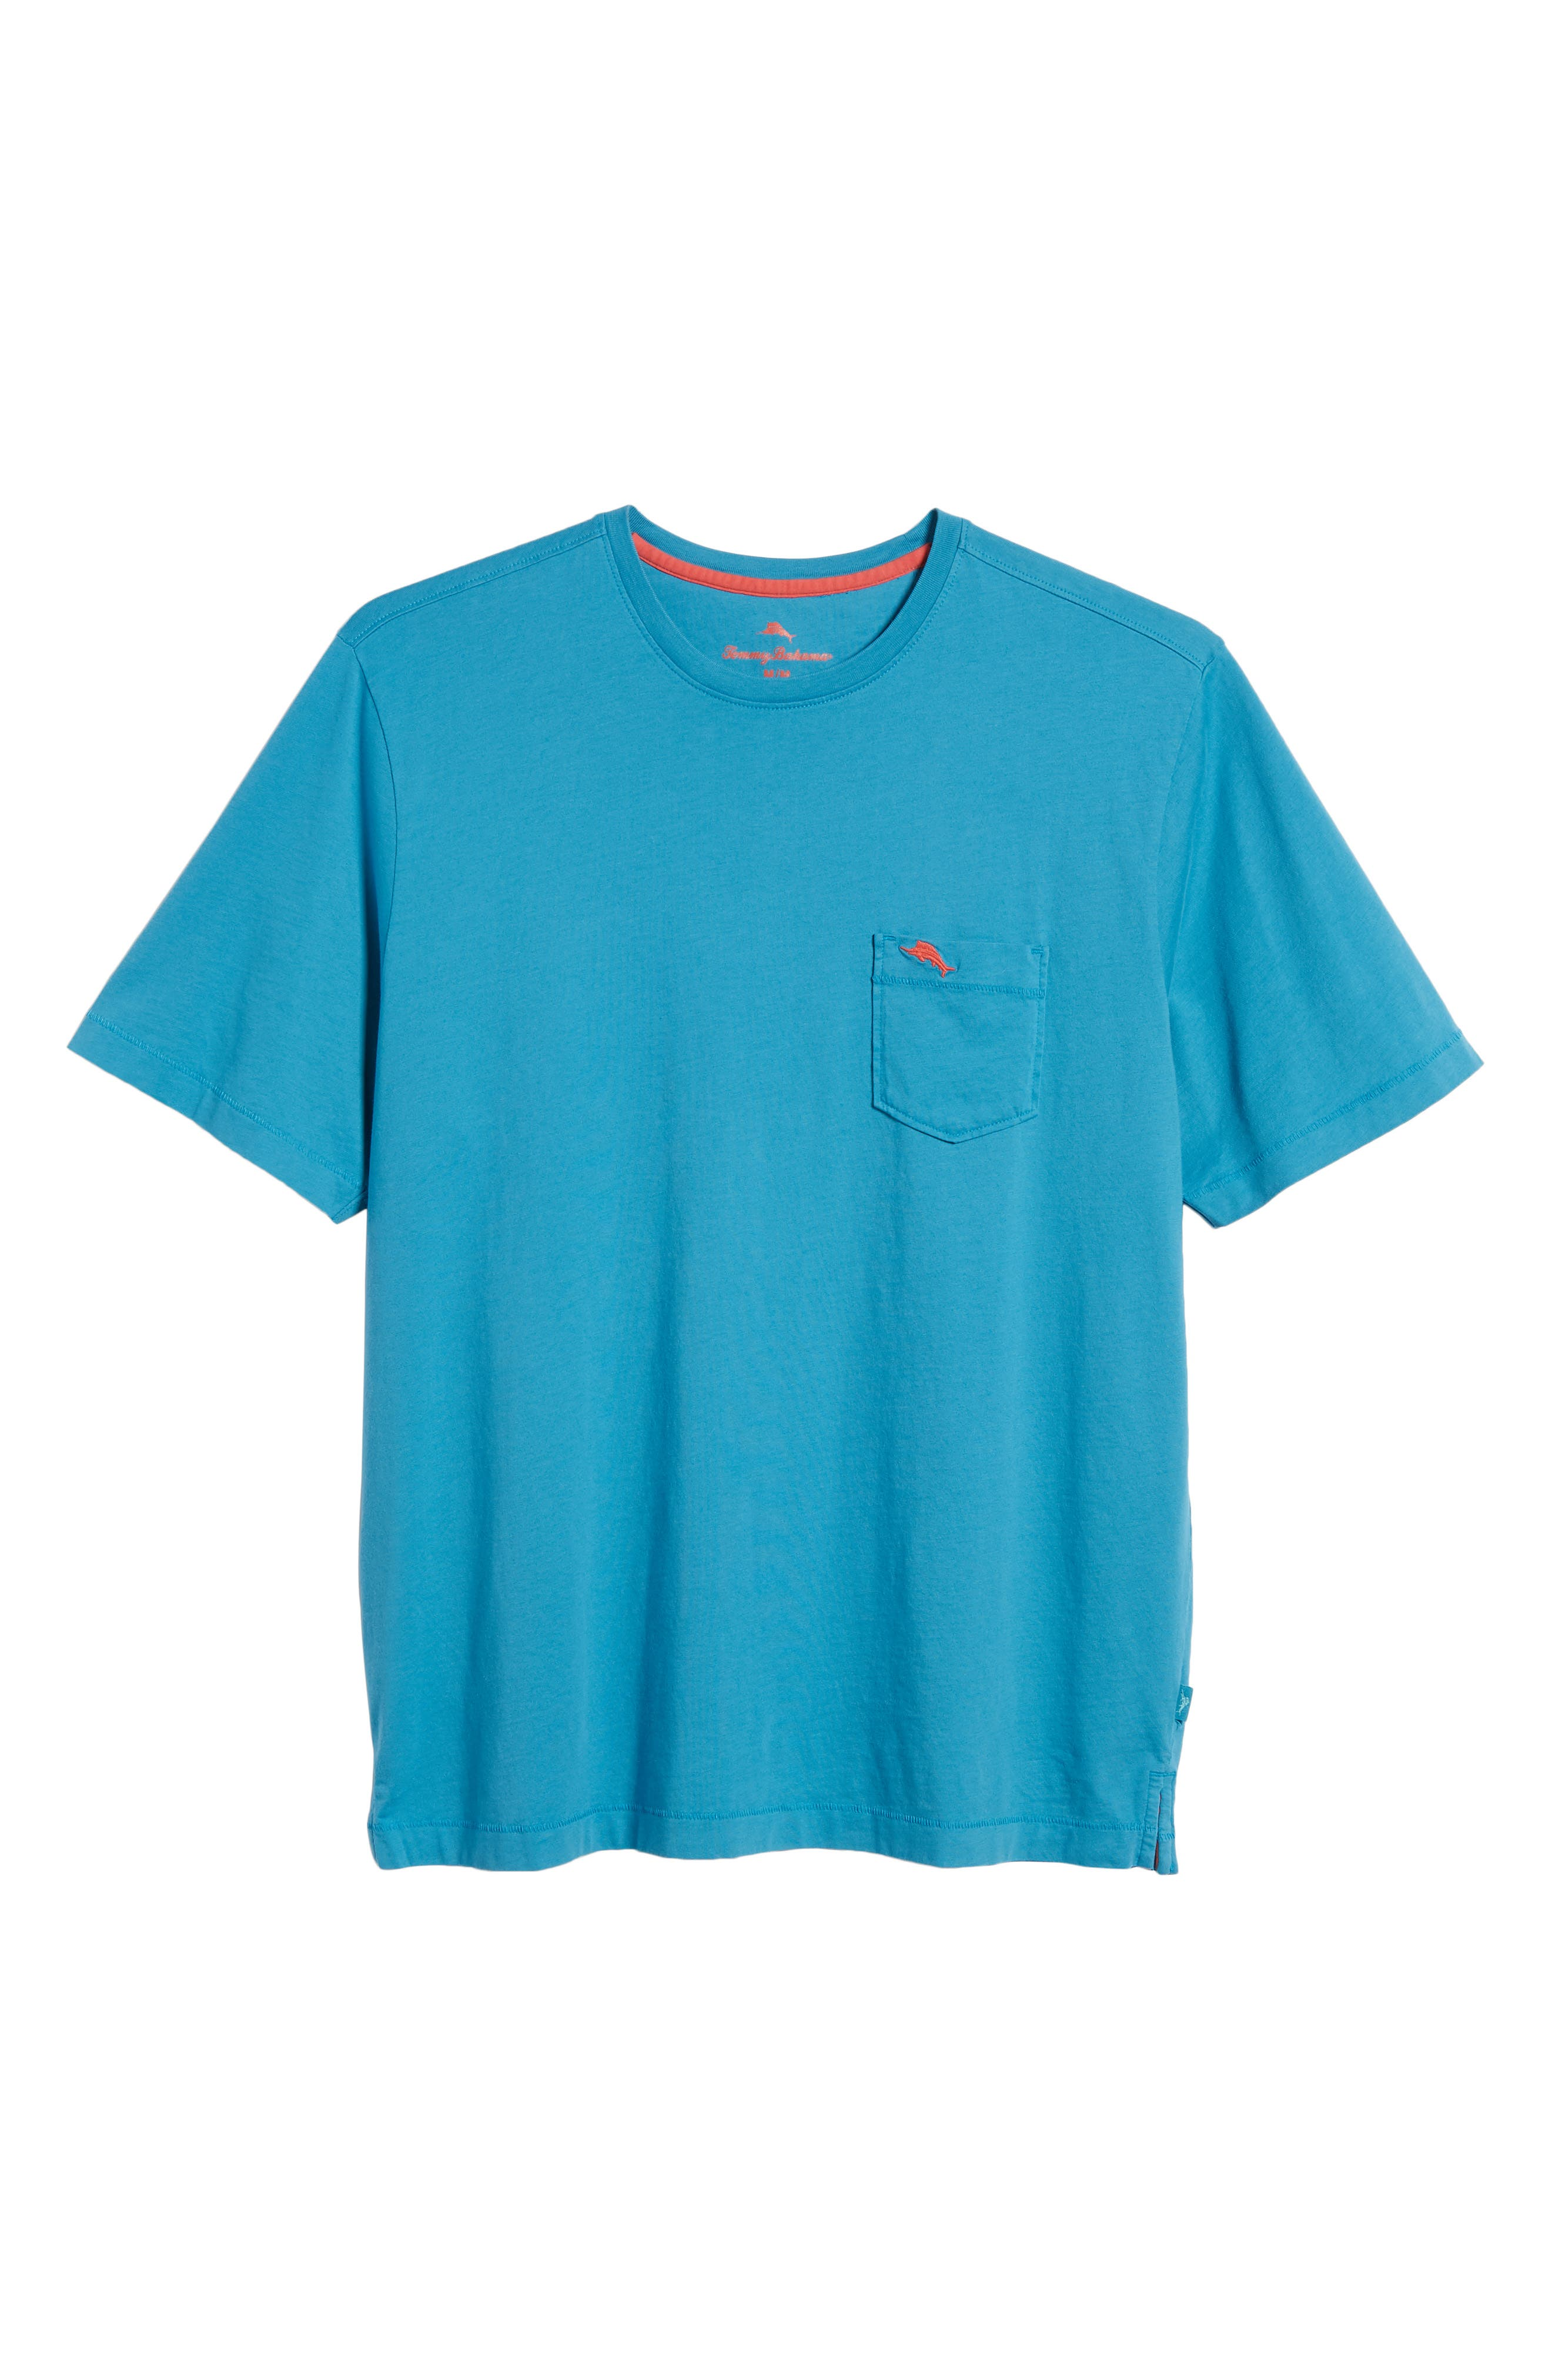 New Bali Sky Pima Cotton Pocket T-Shirt,                             Alternate thumbnail 6, color,                             Voyager Blue